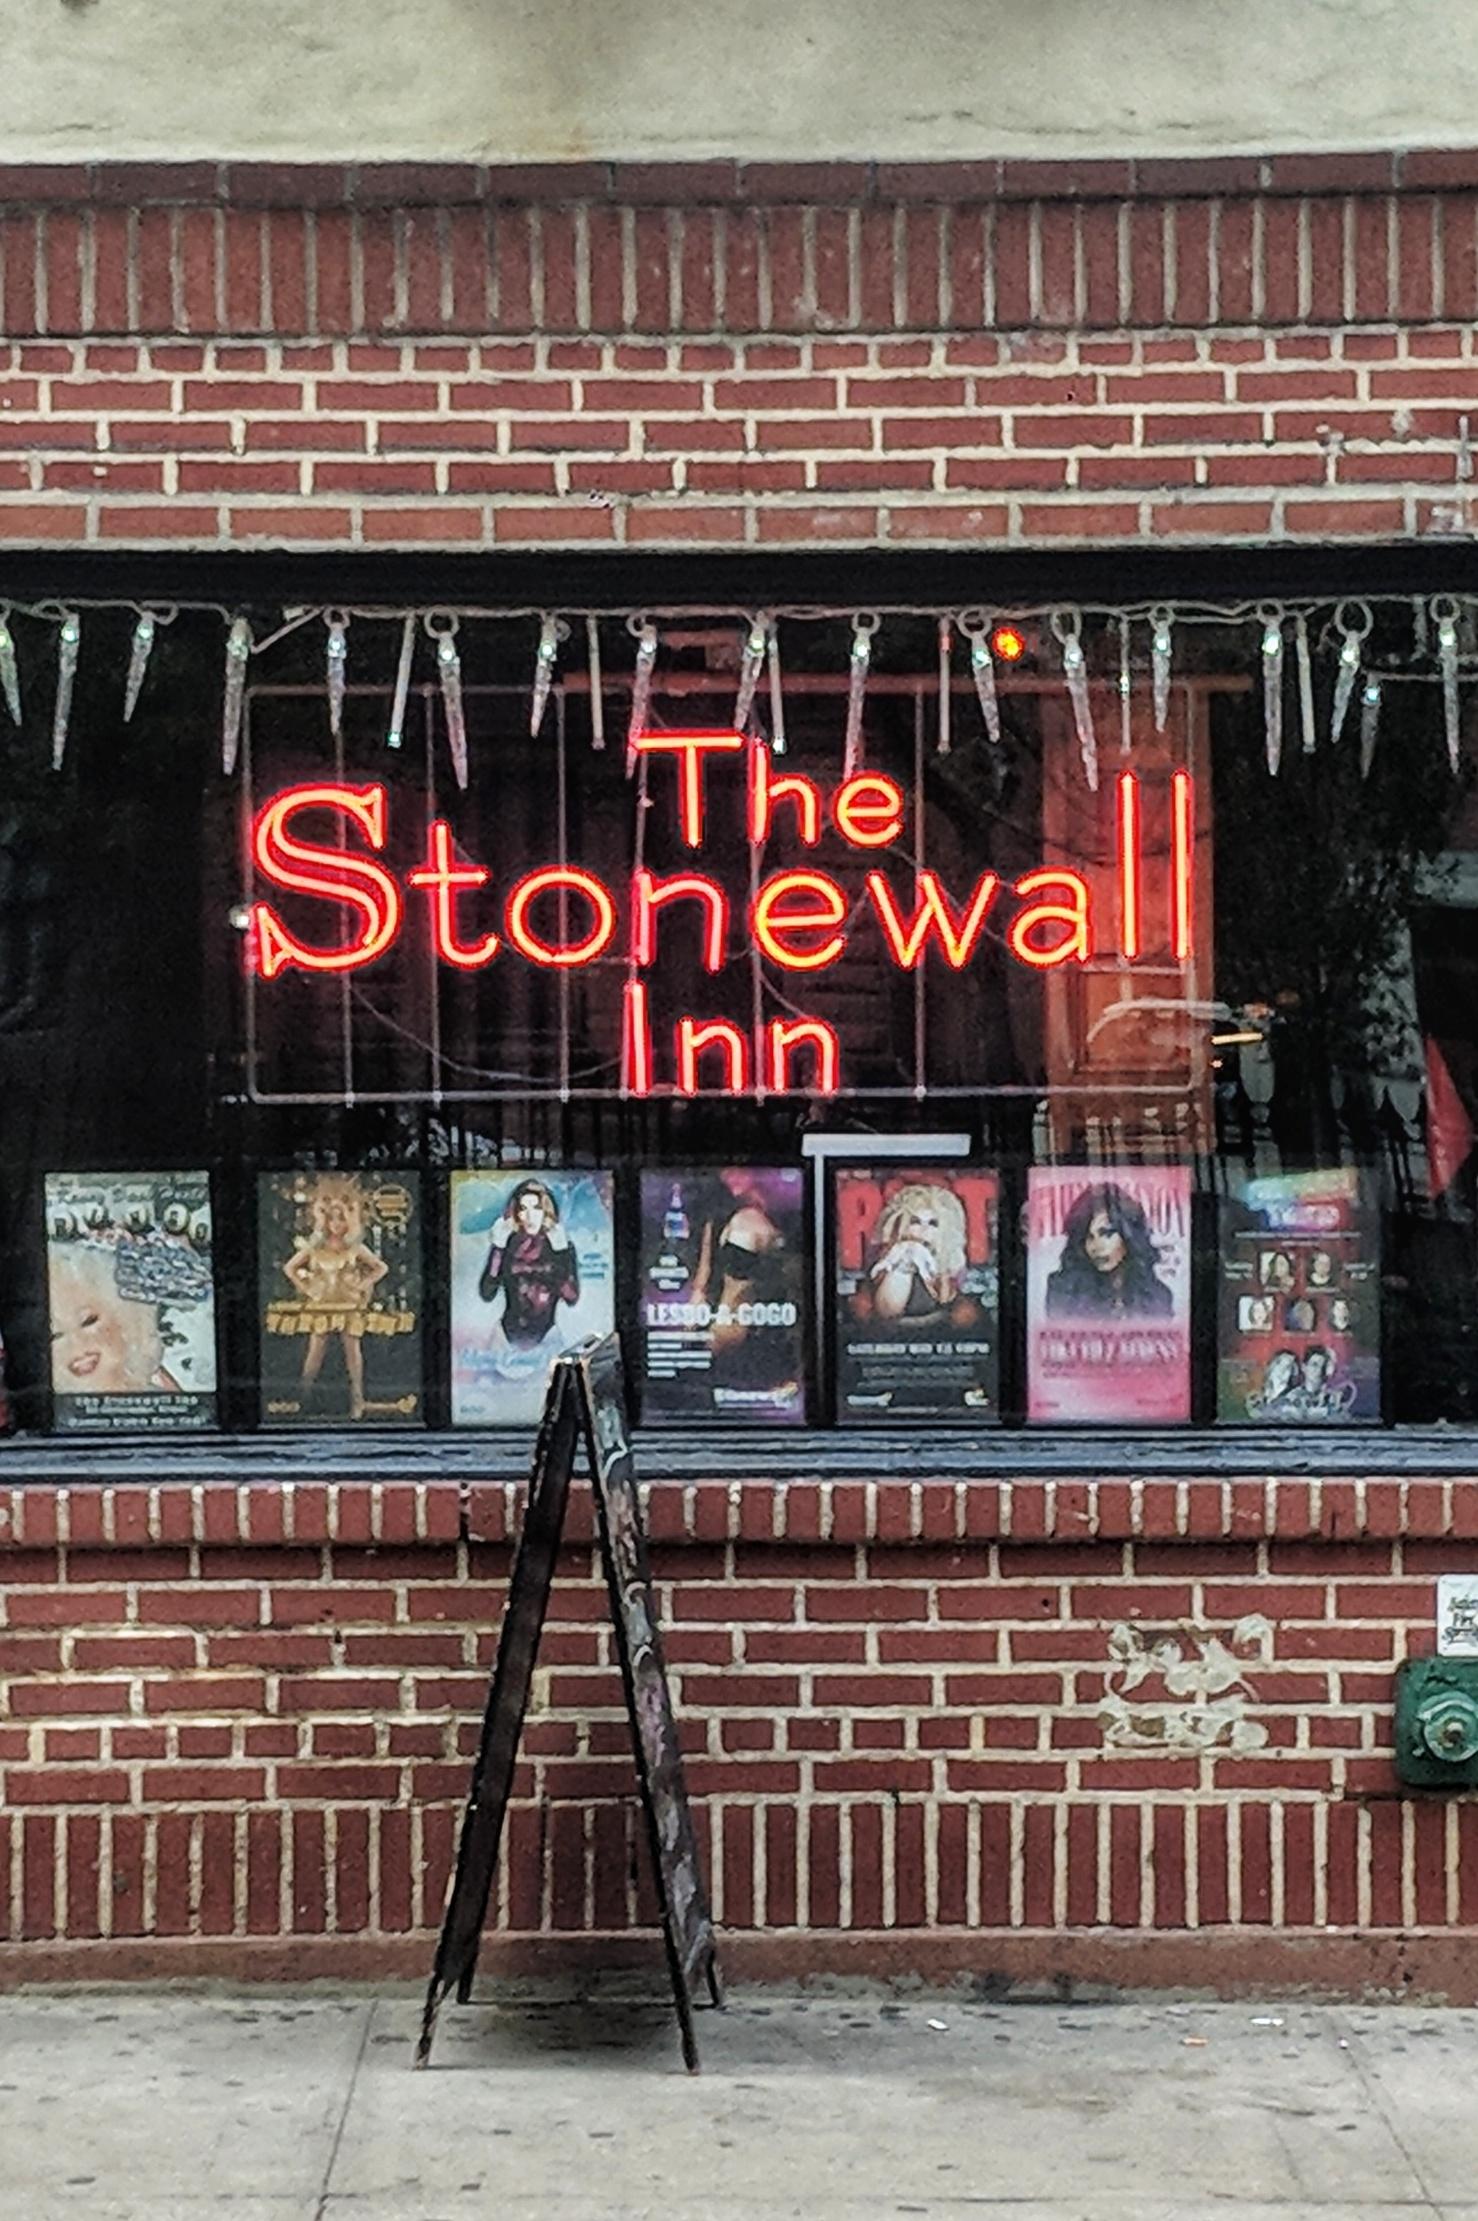 stonewall-inn-adam-groffman.jpeg?1559617998